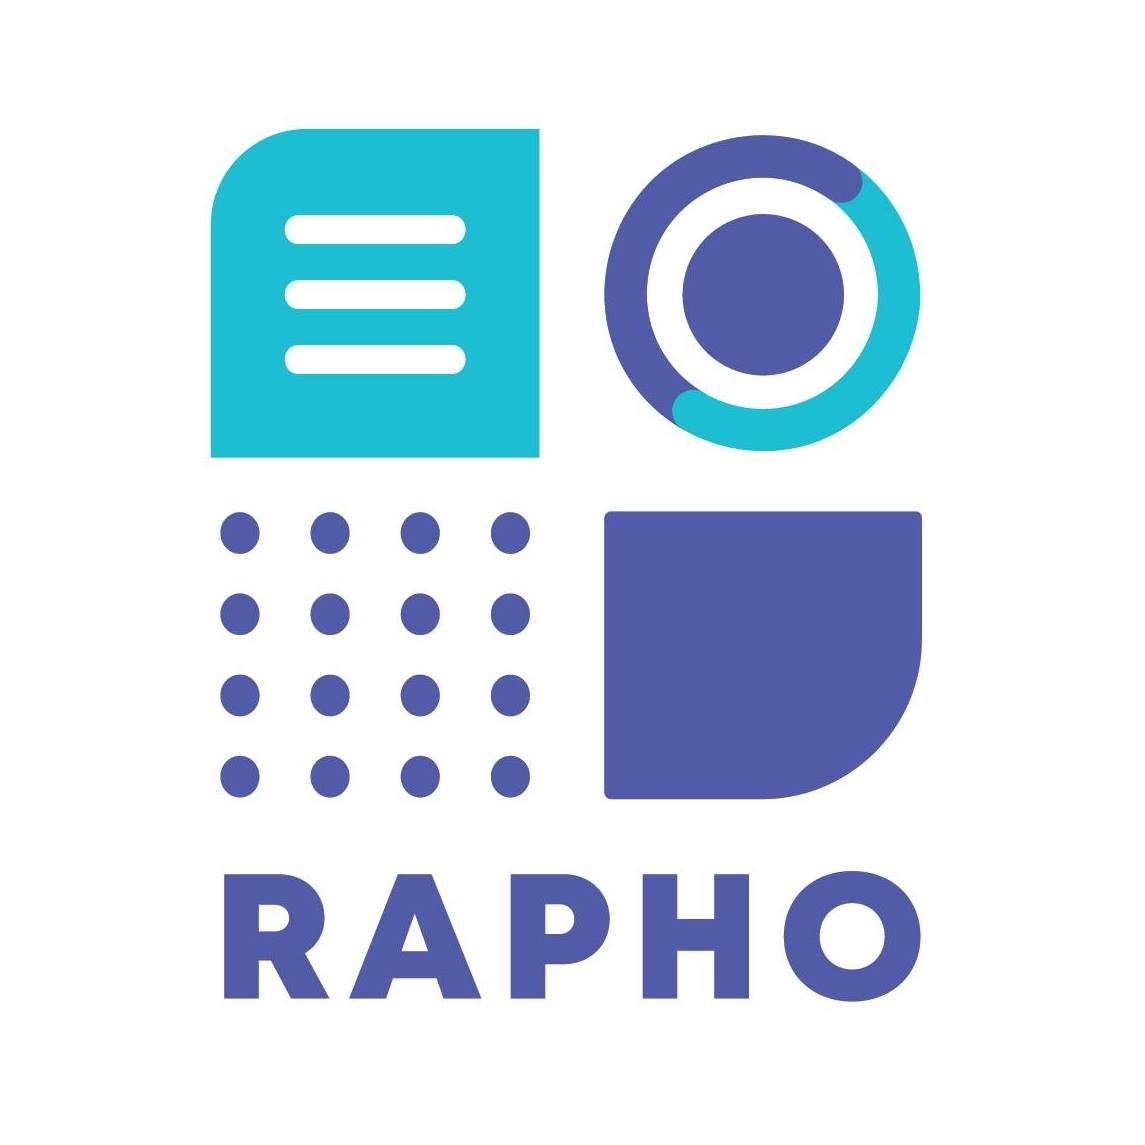 logo RAPHO